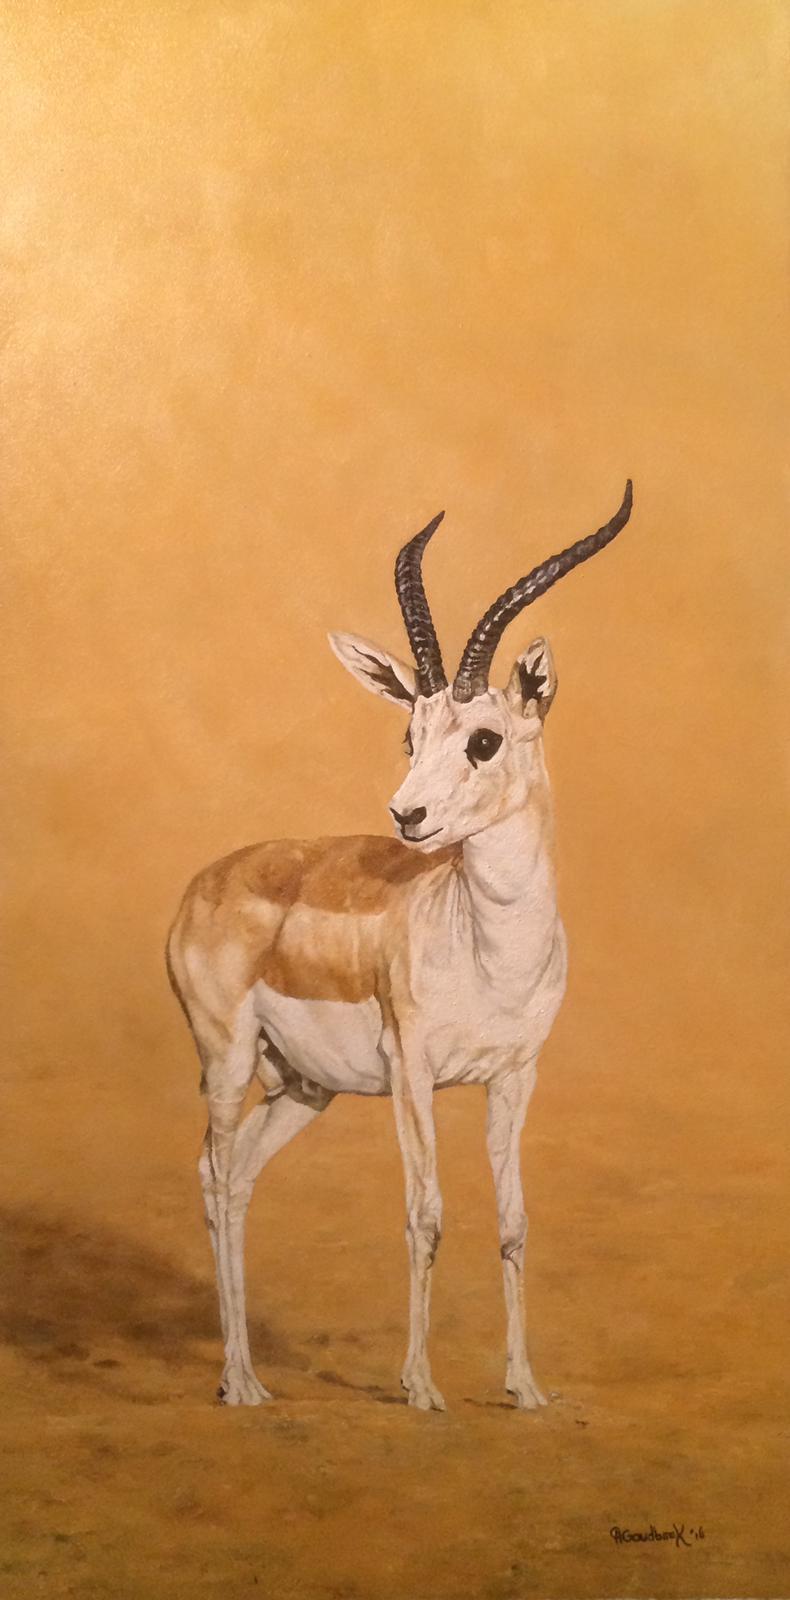 'Sand Gazelle'